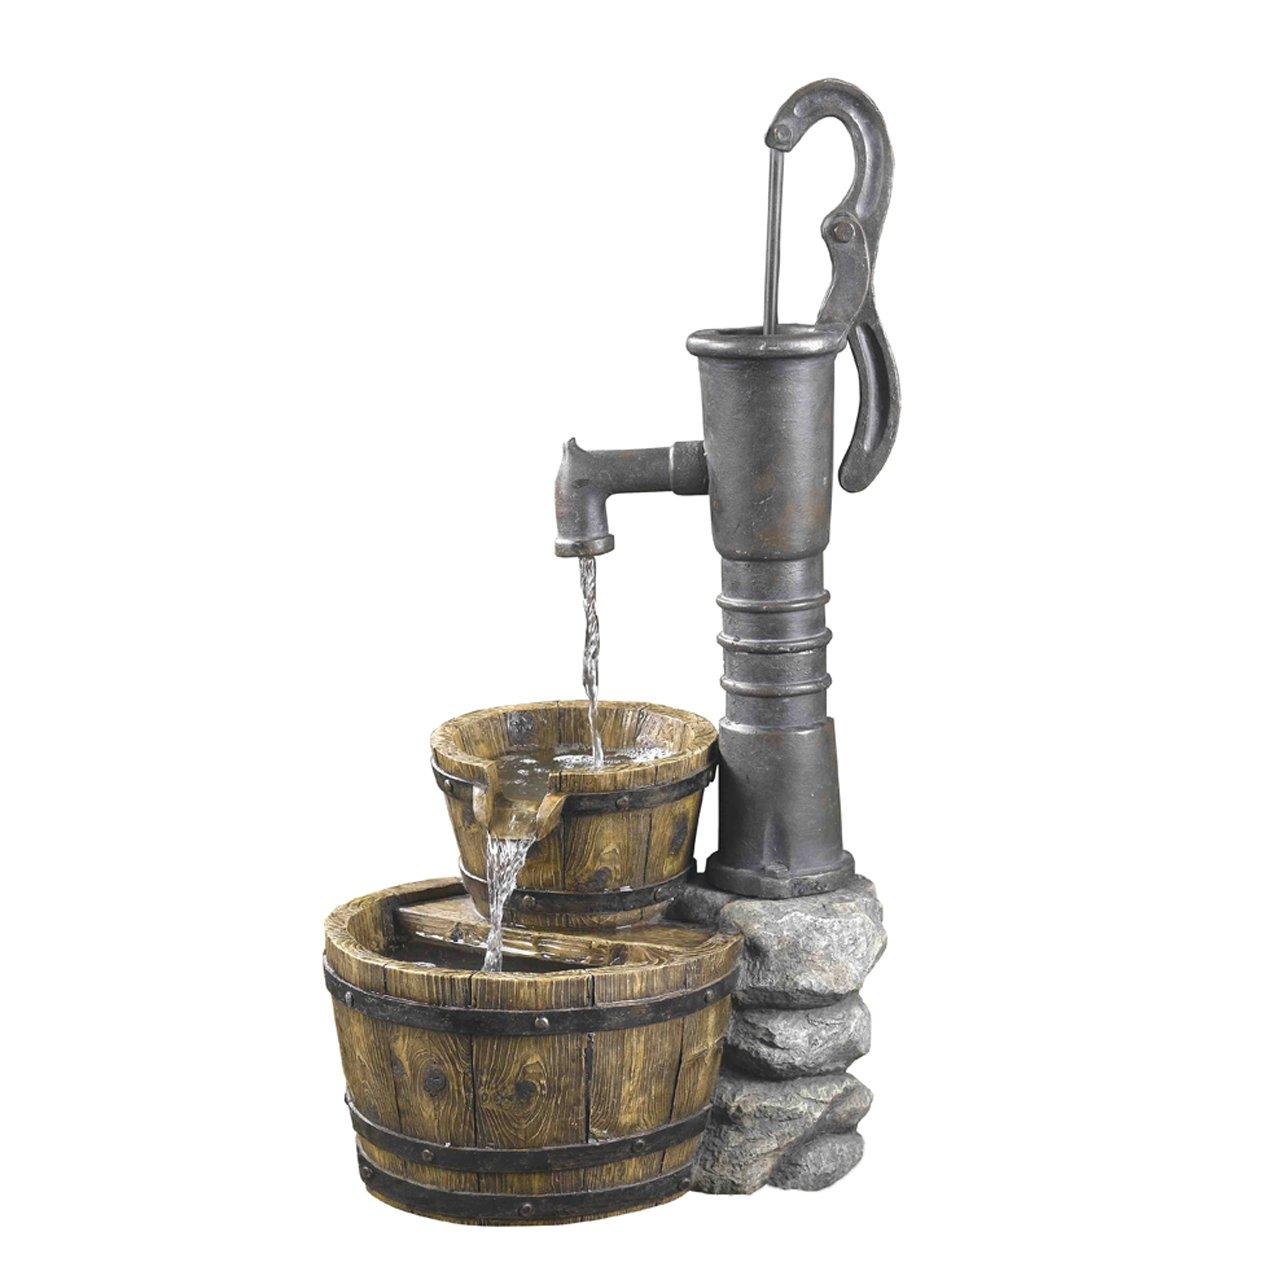 Delightful Amazon.com : Old Fashioned Pump Water Fountain : Free Standing Garden  Fountains : Garden U0026 Outdoor